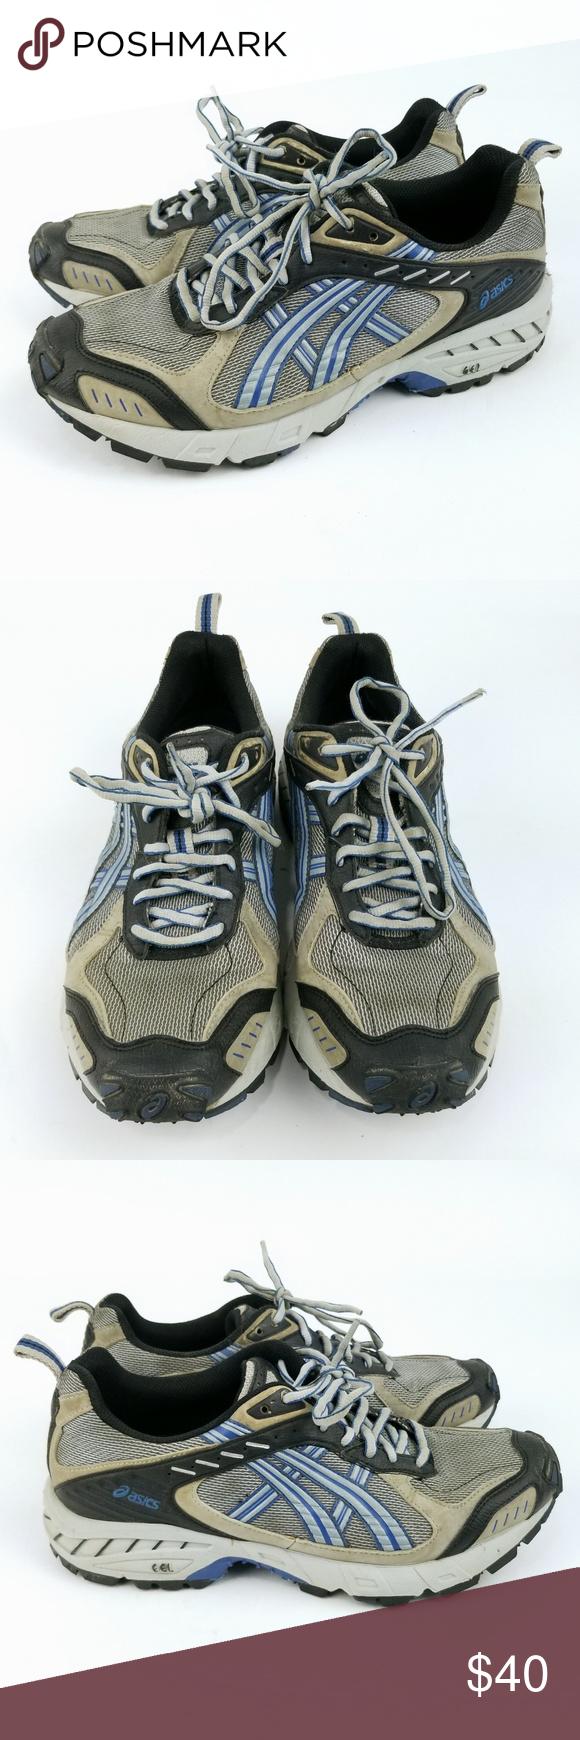 3cd14c75f72a ASICS Running Shoes GEL Arctic 7.5 Studs EF43 Men s ASICS Running Shoes  TN833 GEL Arctic 7.5